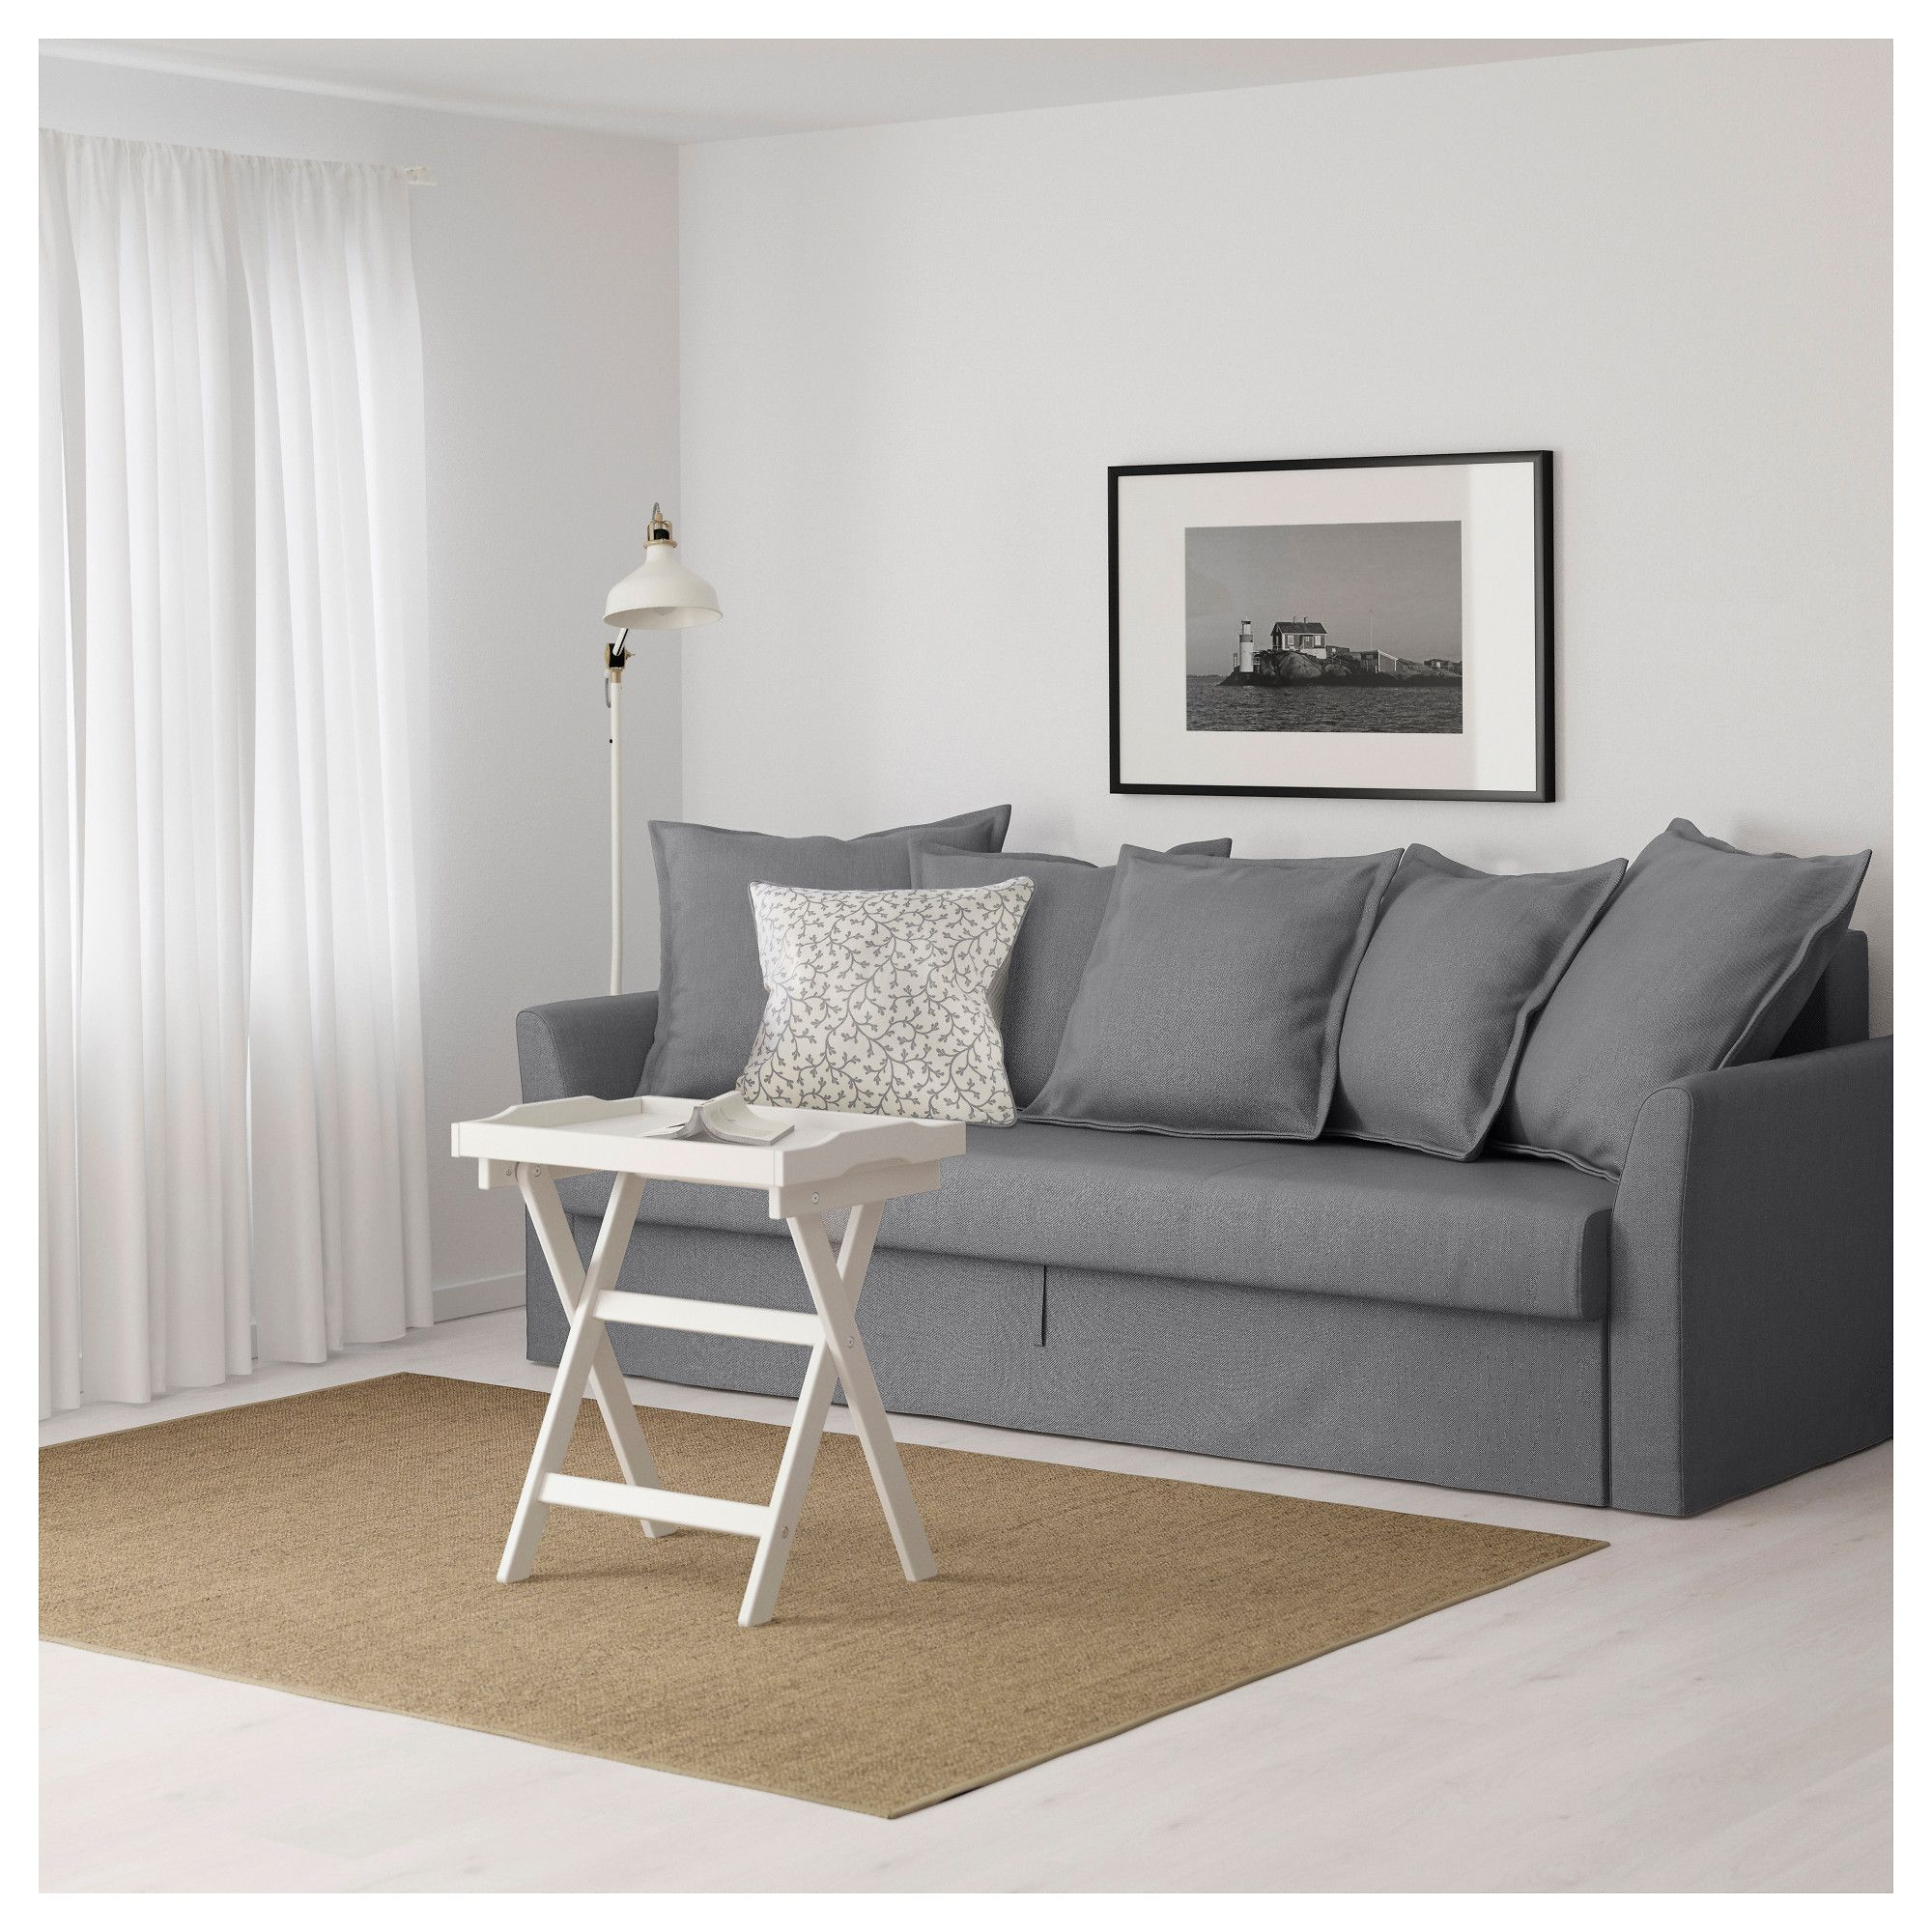 IKEA HOLMSUND Sofa bed Nordvalla medium gray